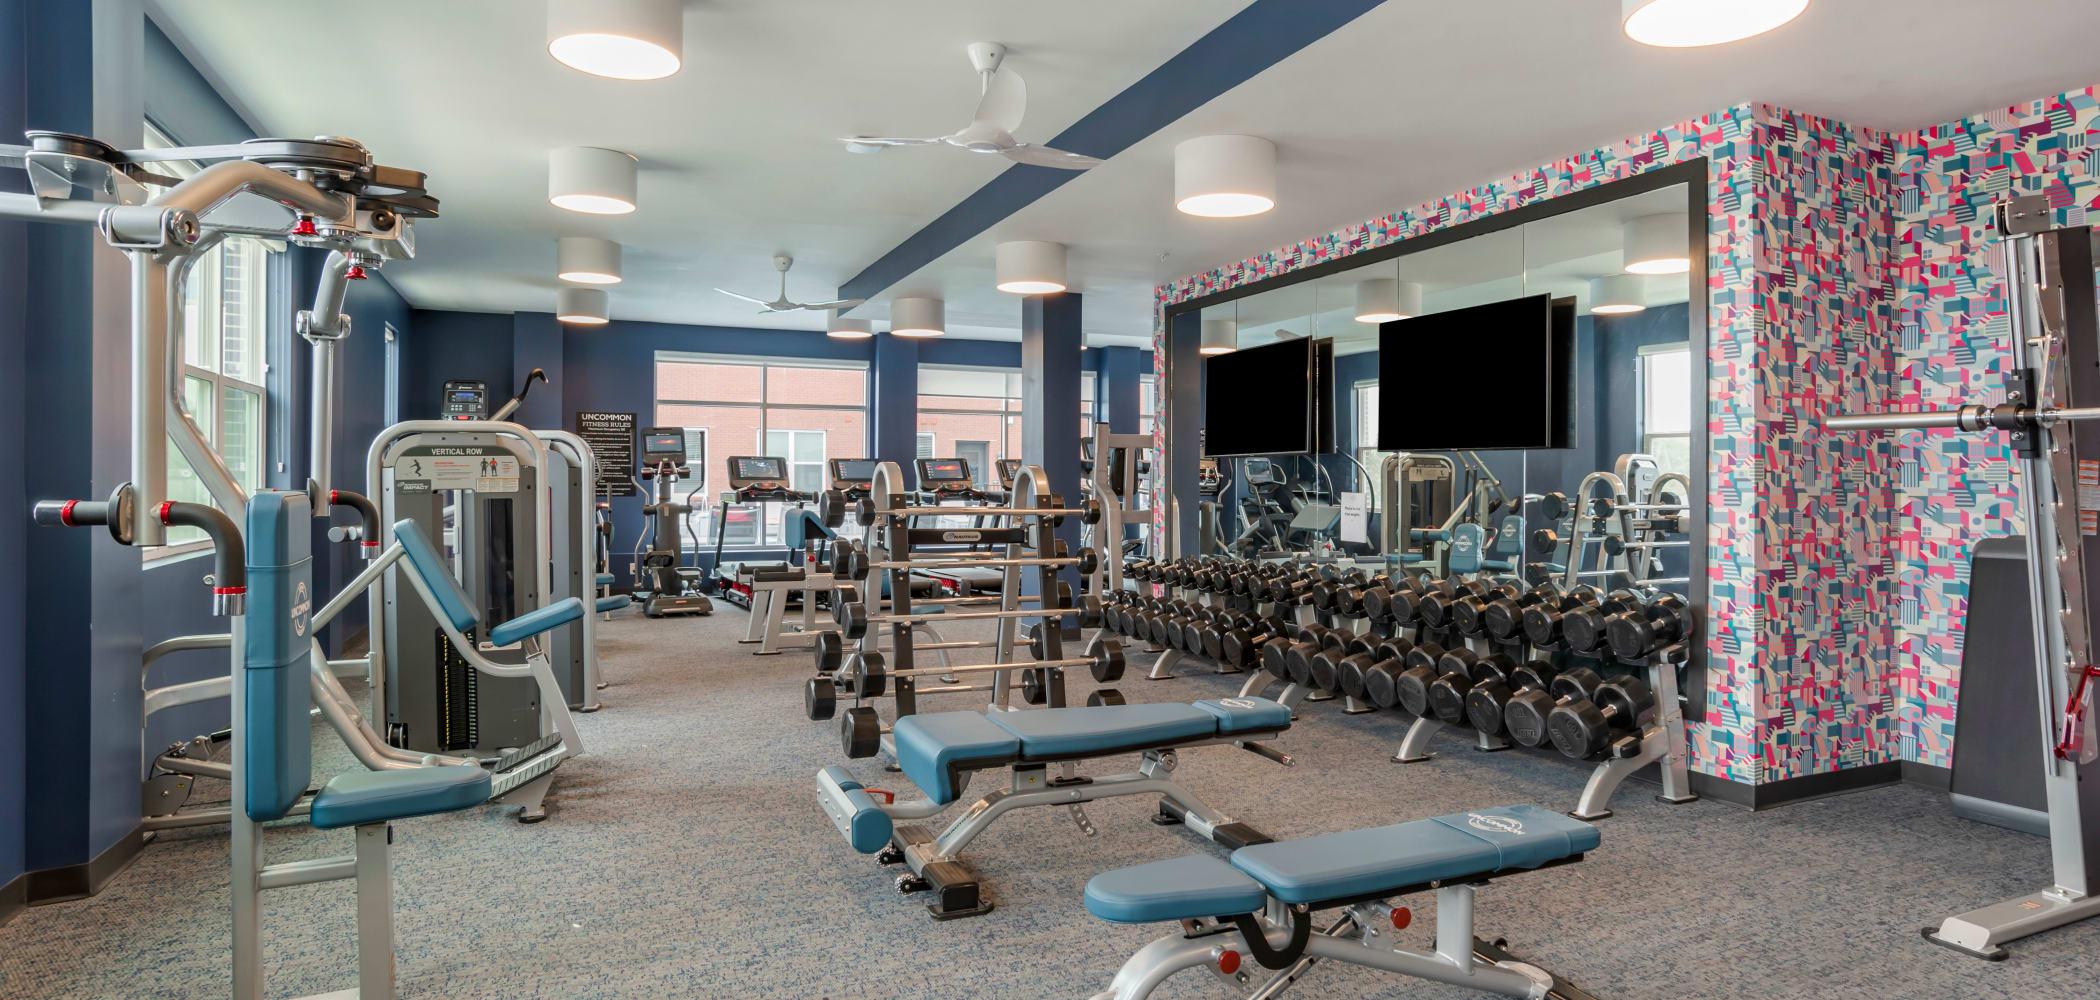 State of the art fitness center at UNCOMMON Auburn in Auburn, Alabama